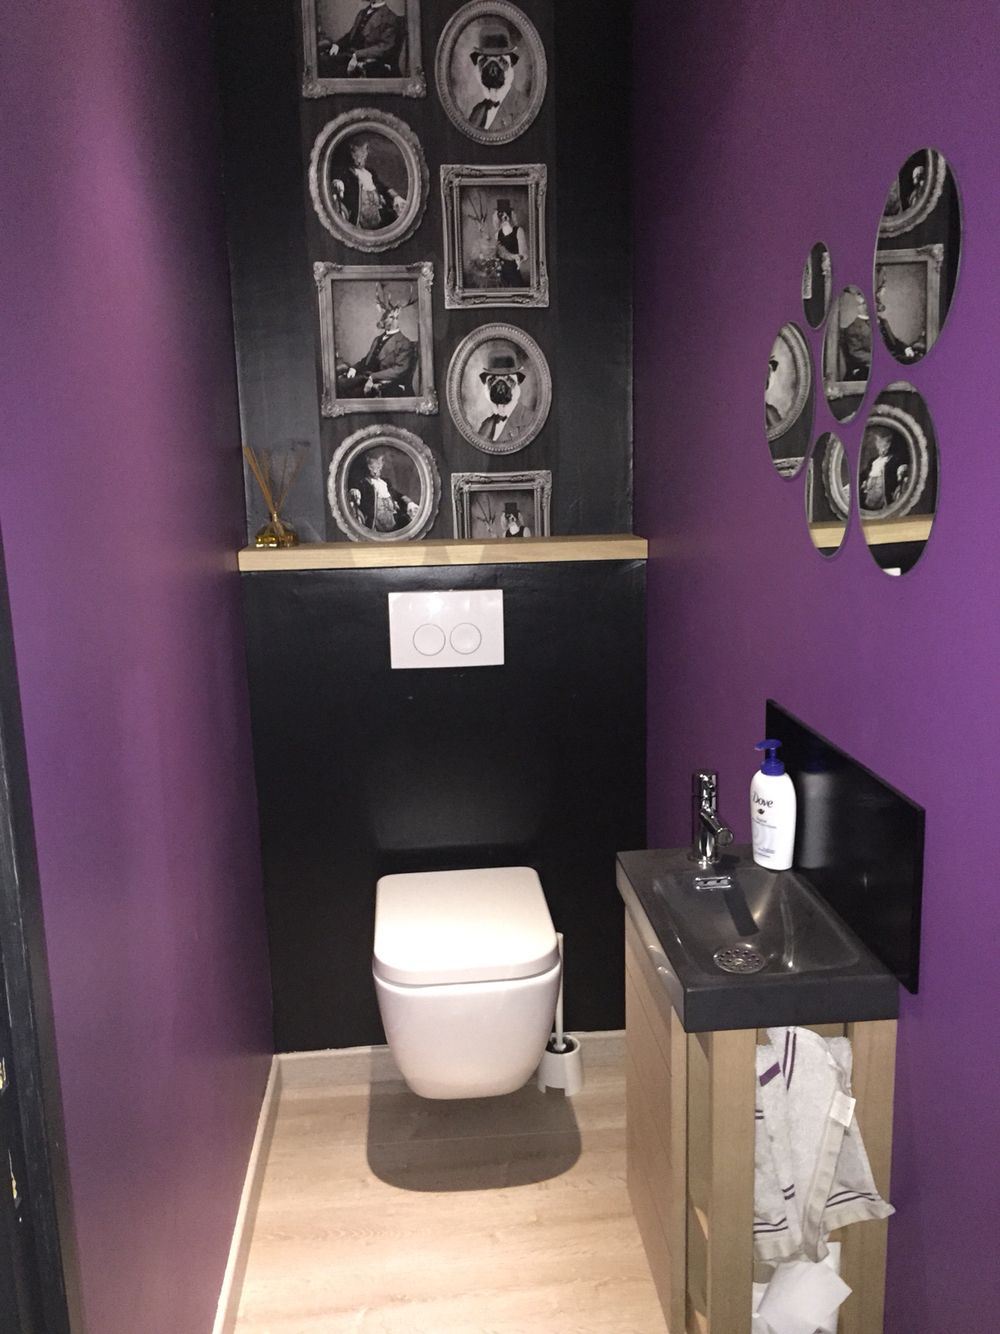 Wc Made In Moi Wc Suspendu Peinture Prune Leroy Merlin dedans Toilettes Leroy Merlin